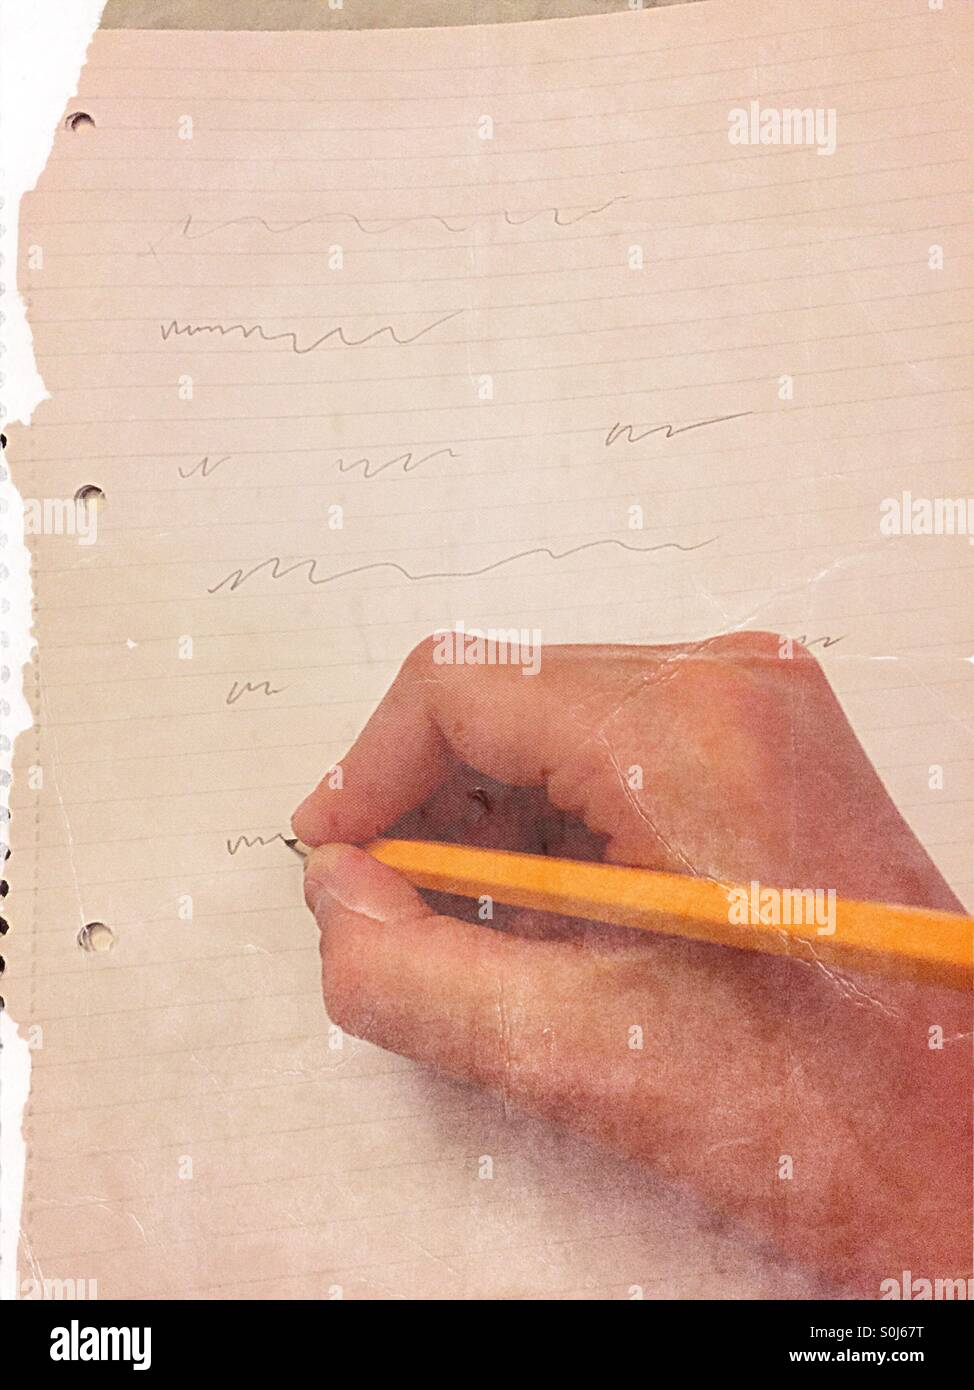 Writting a story - Stock Image